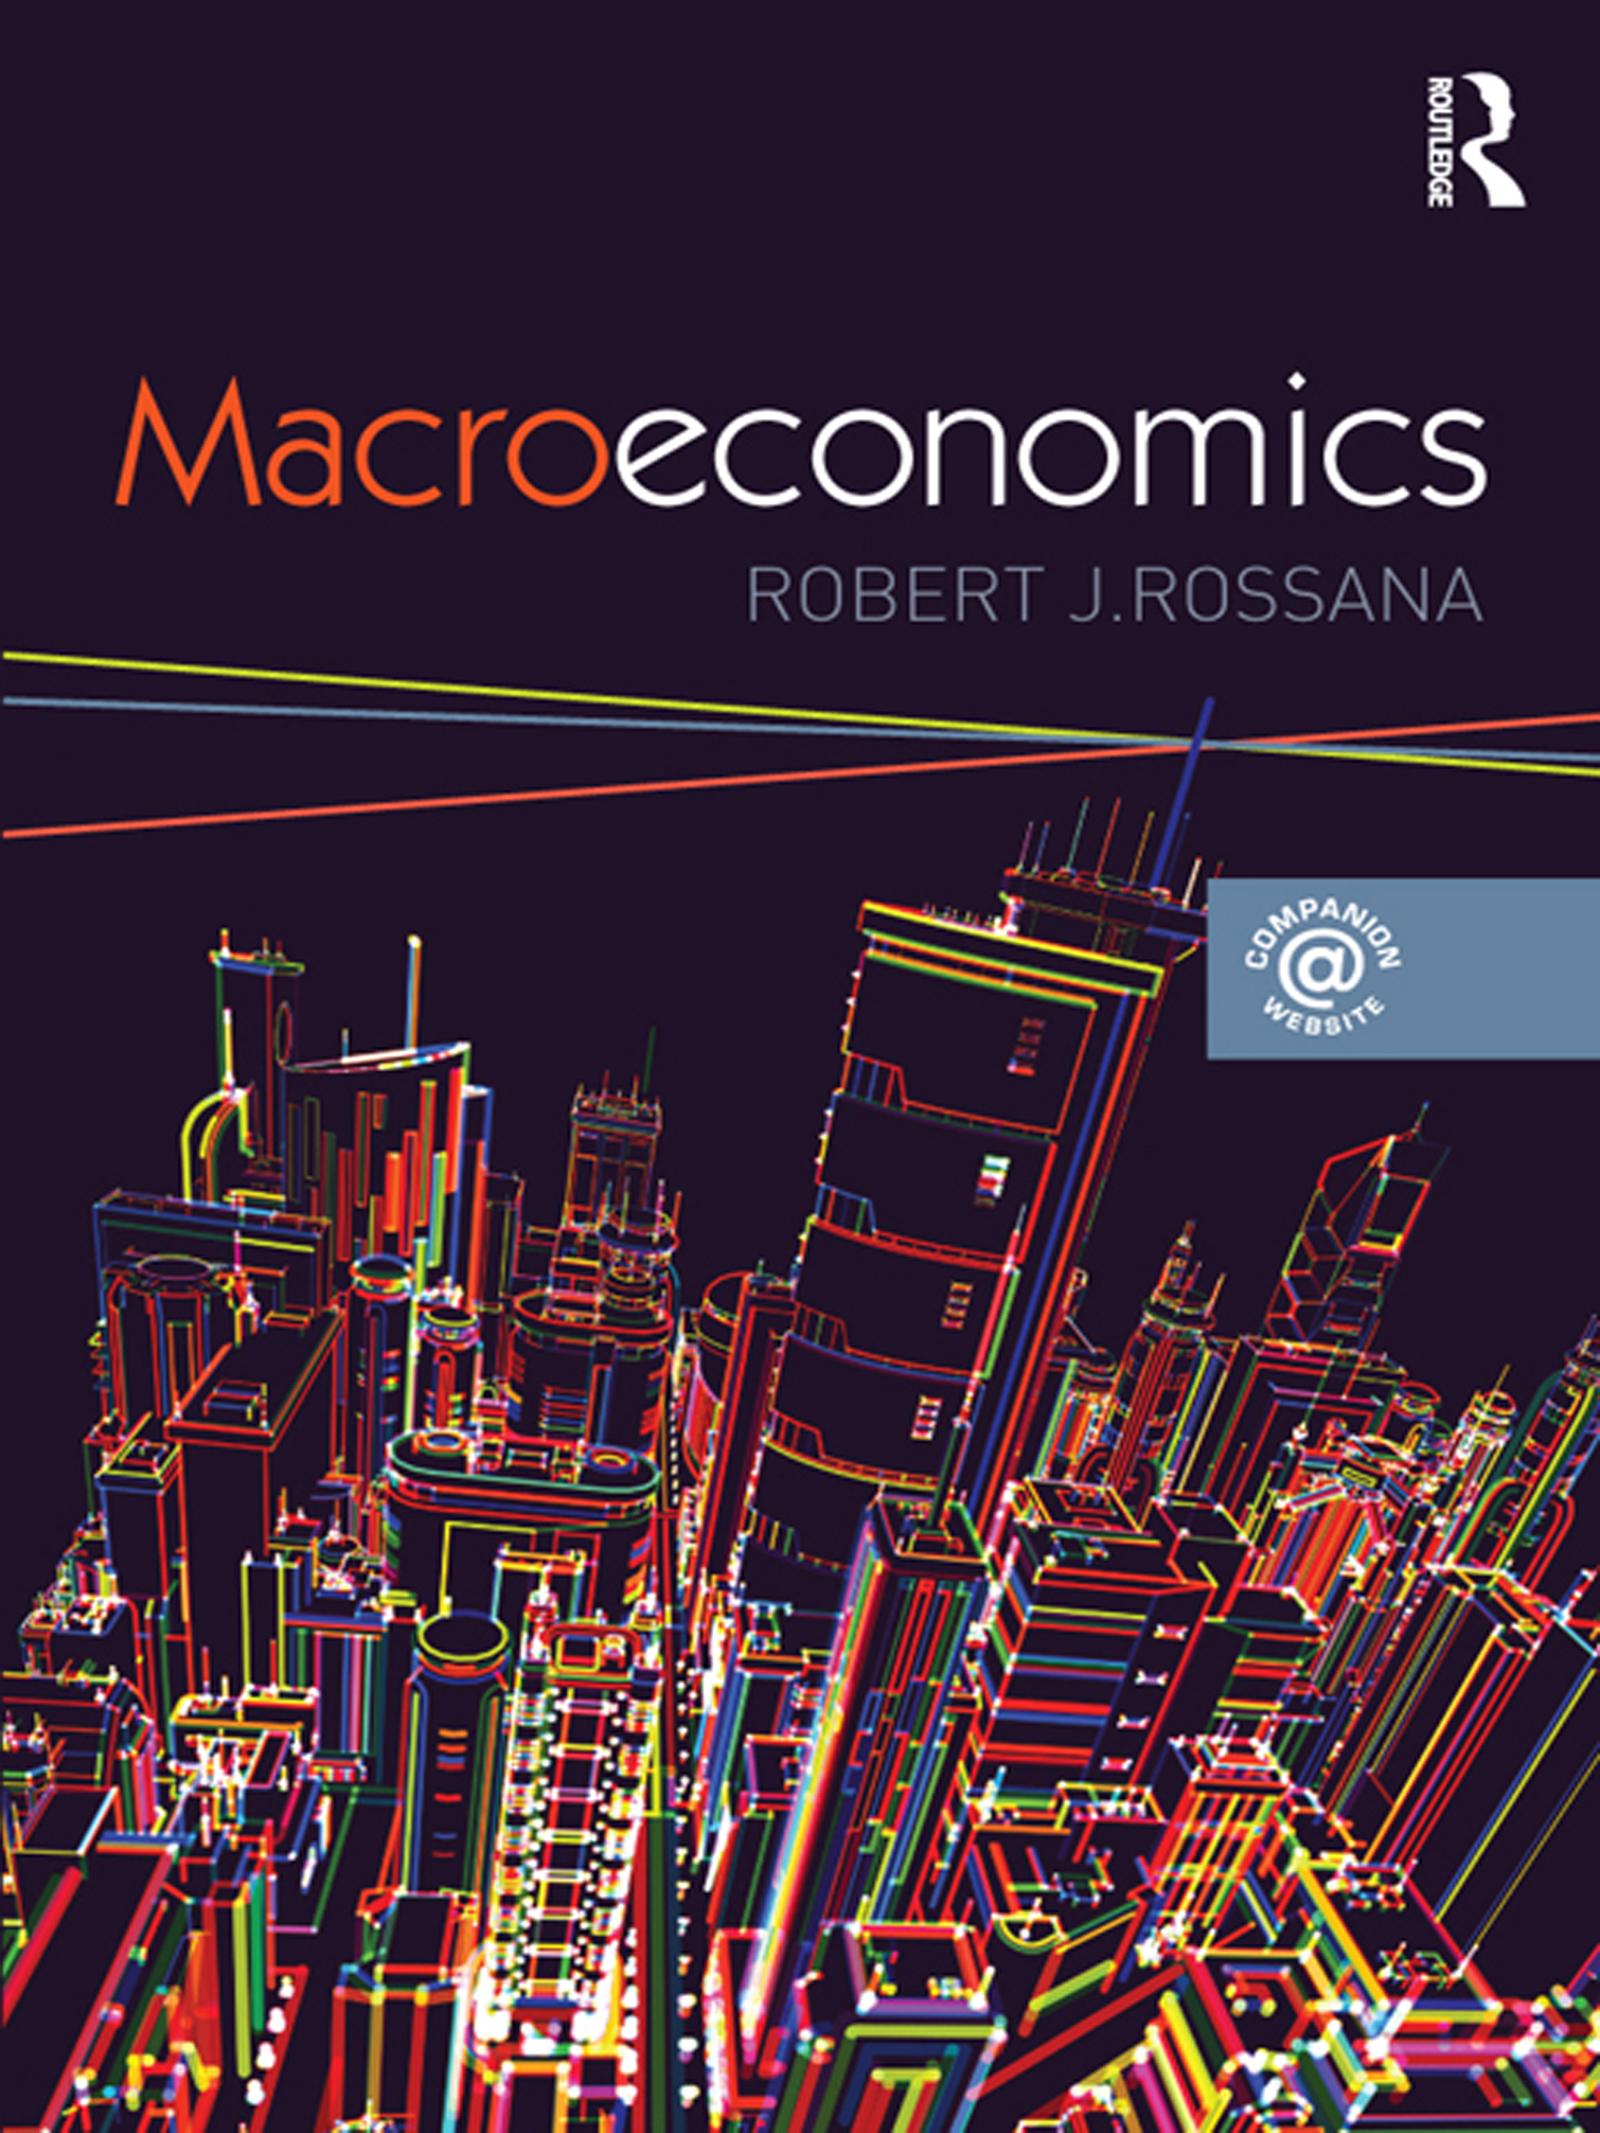 Download Ebook Macroeconomics by Robert J. Rossana Pdf